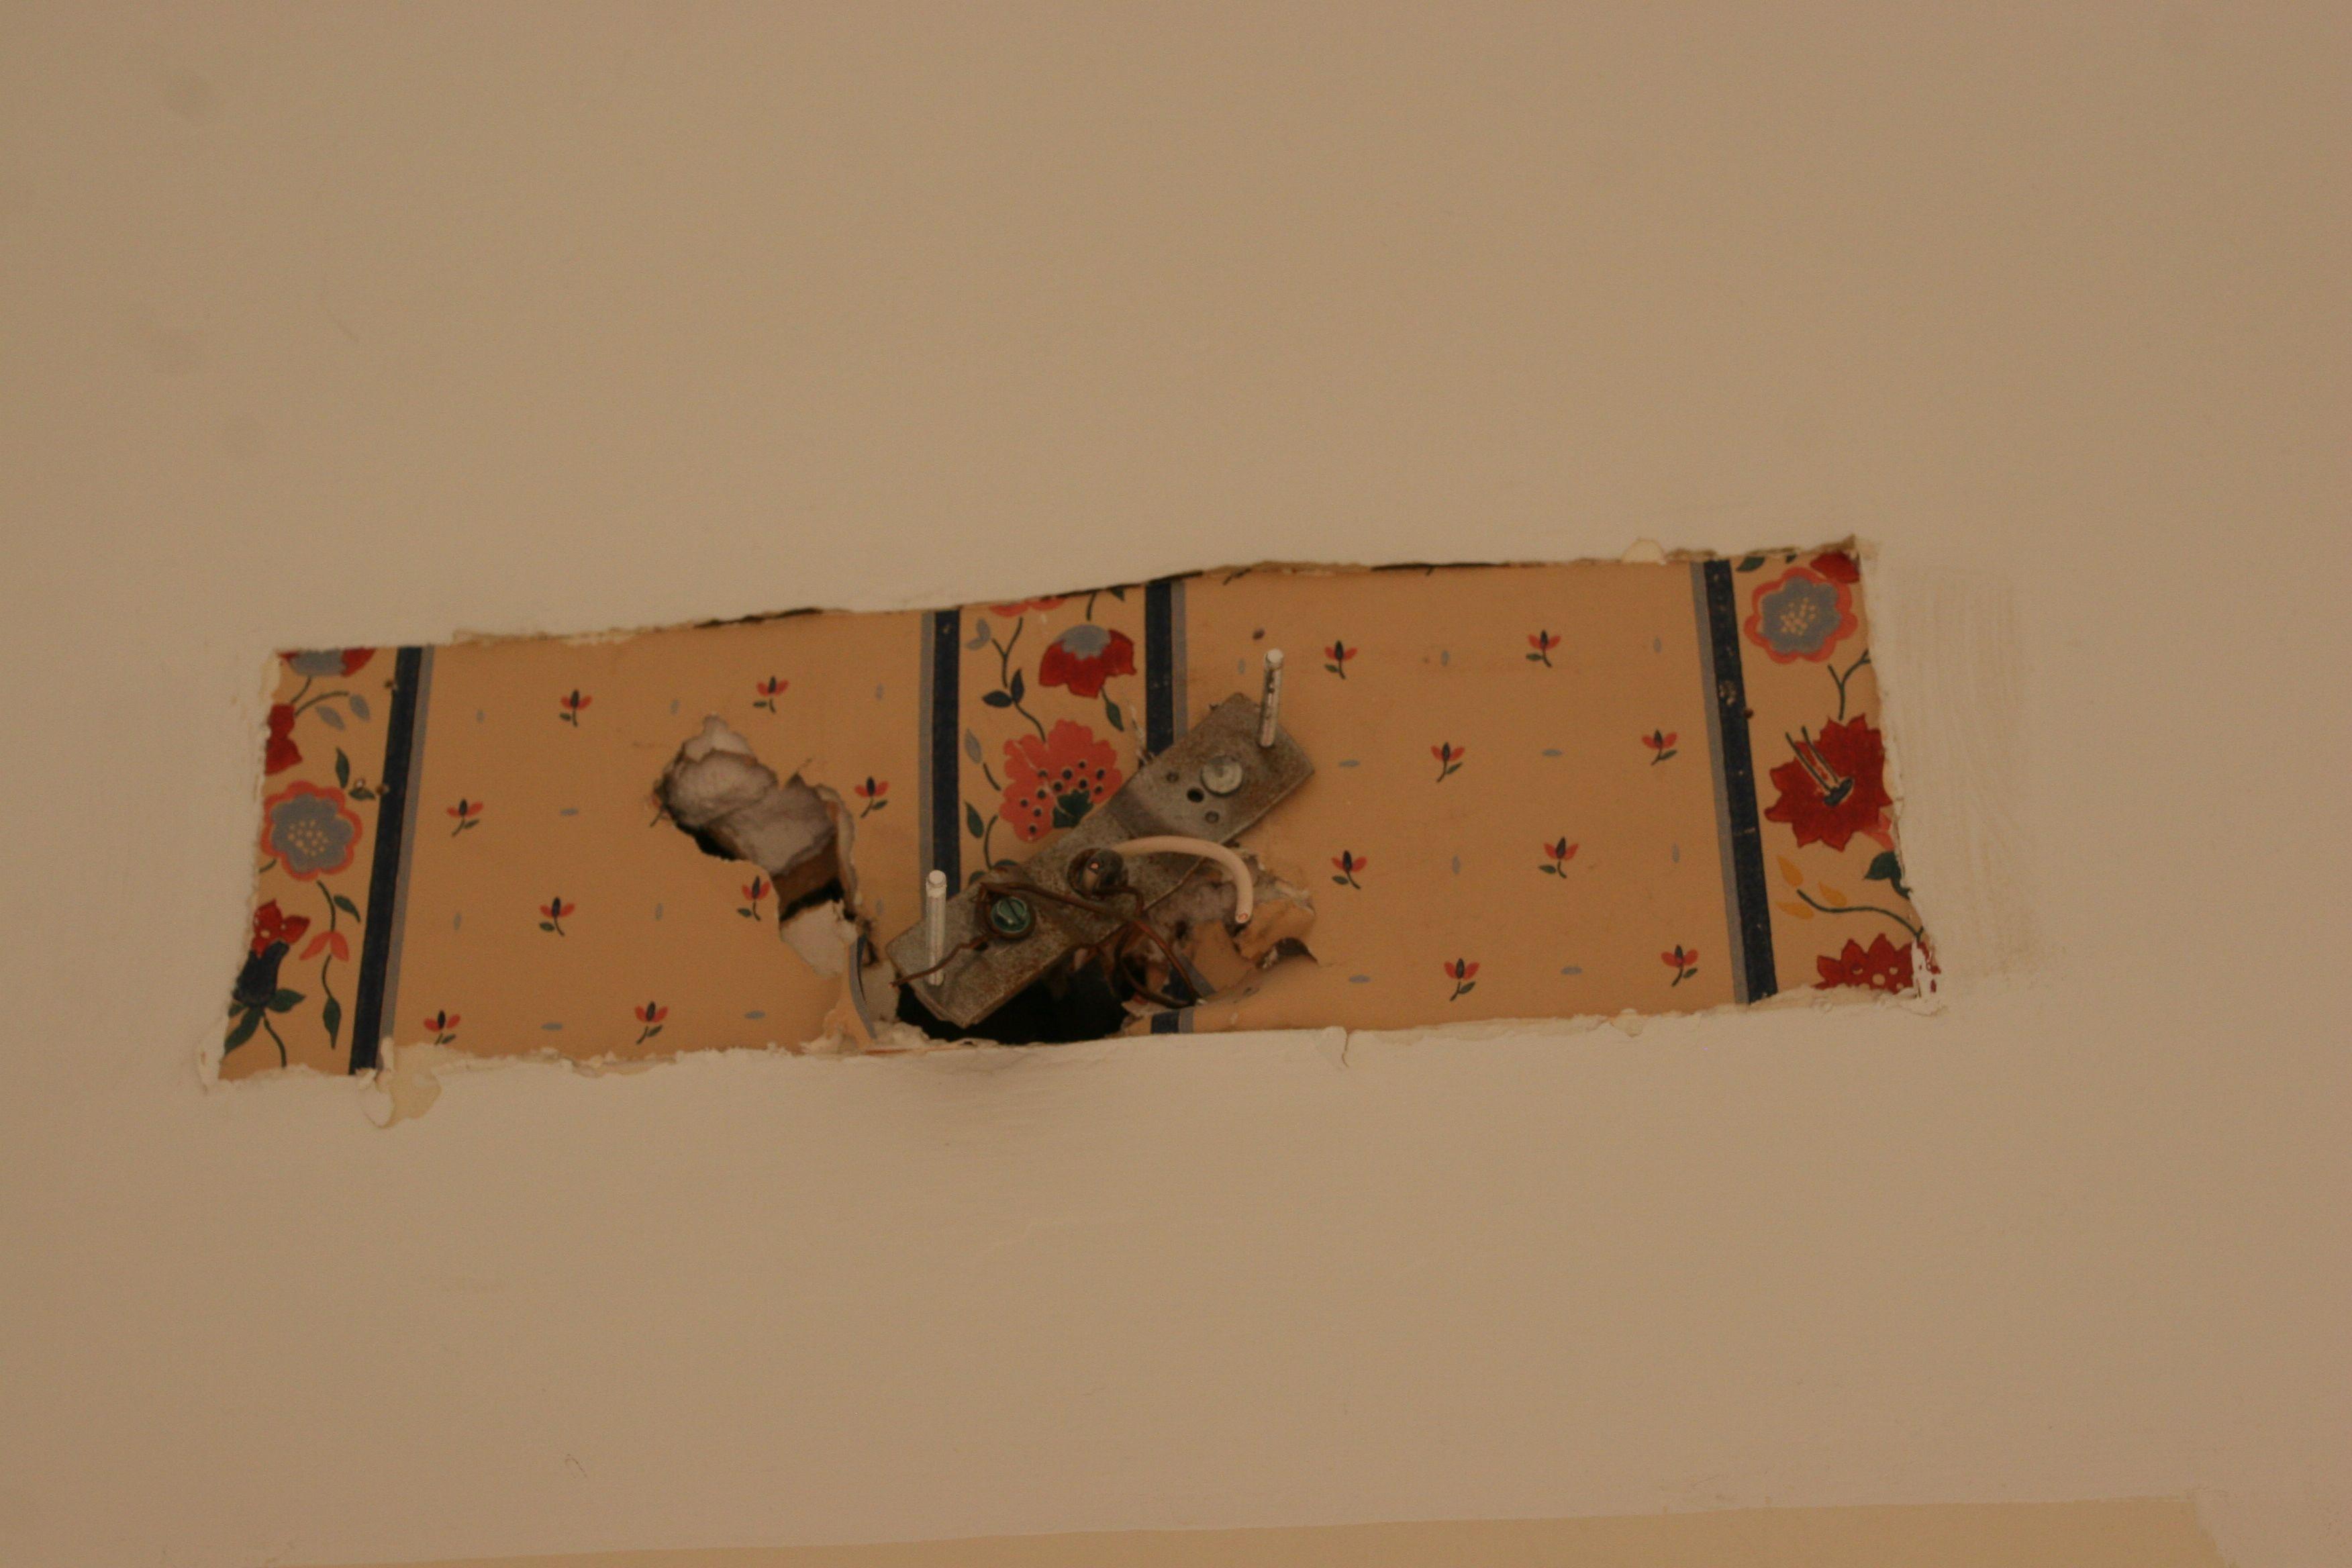 More wallpaper!